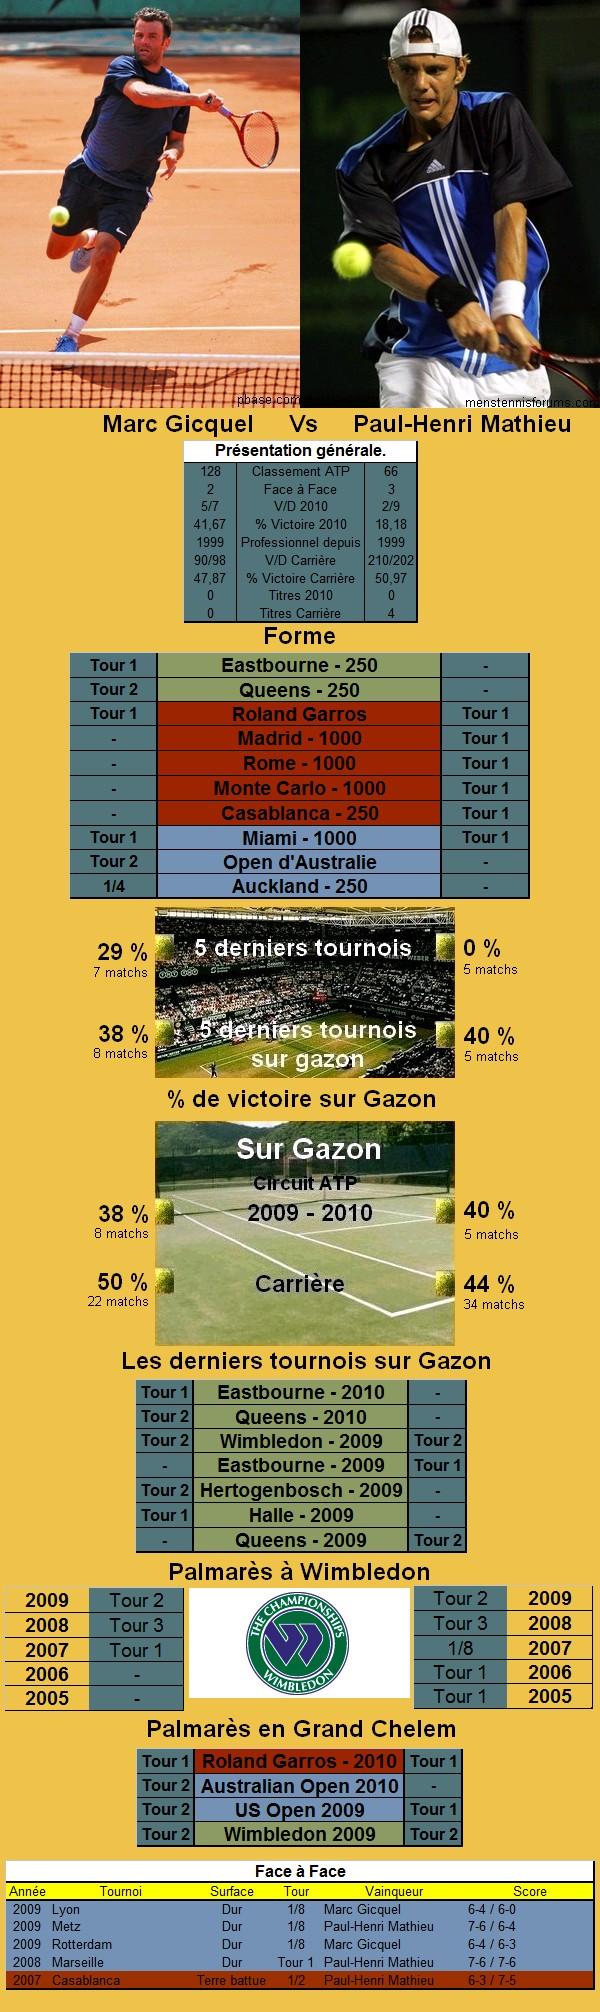 Statistiques tennis de Gicquel contre Mathieu à Wimbledon